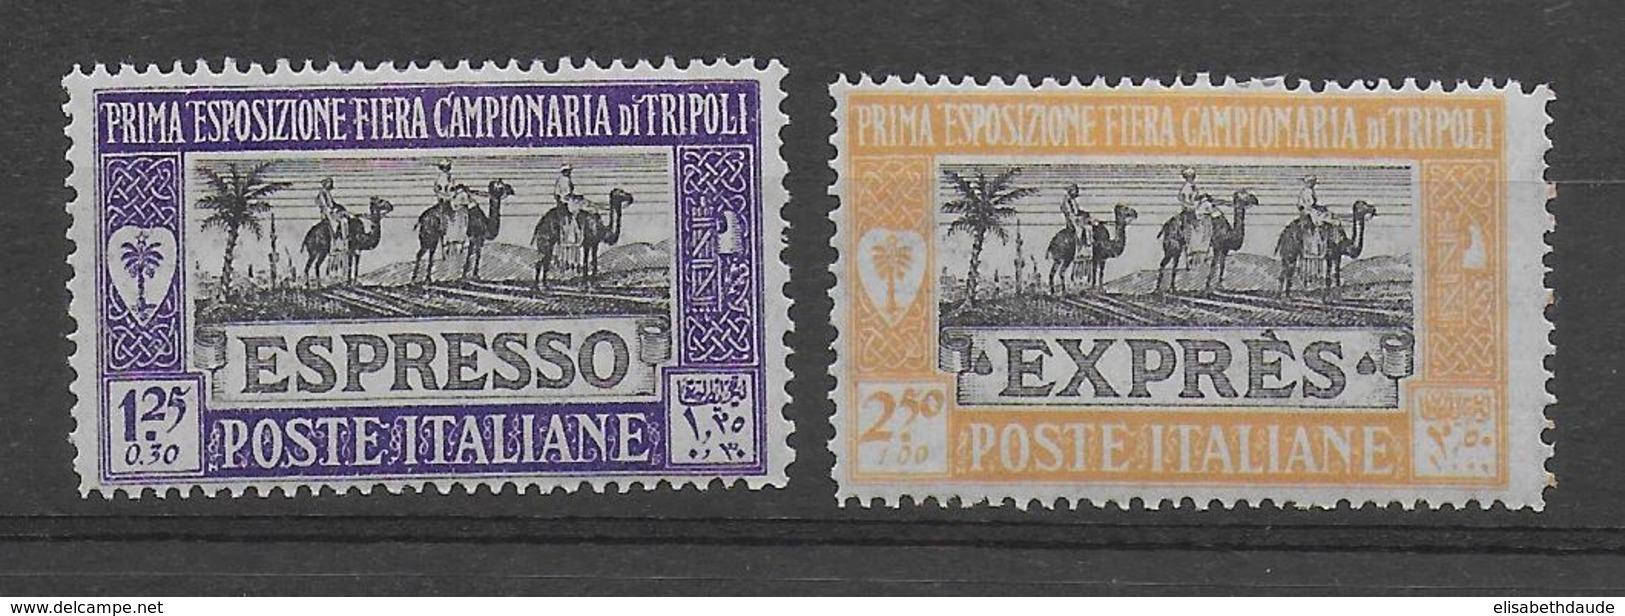 COLONIE ITALIENNE - TRIPOLI - EXPRES N° 1/2 * MLH - COTE = 23 EUR. - Tripolitania